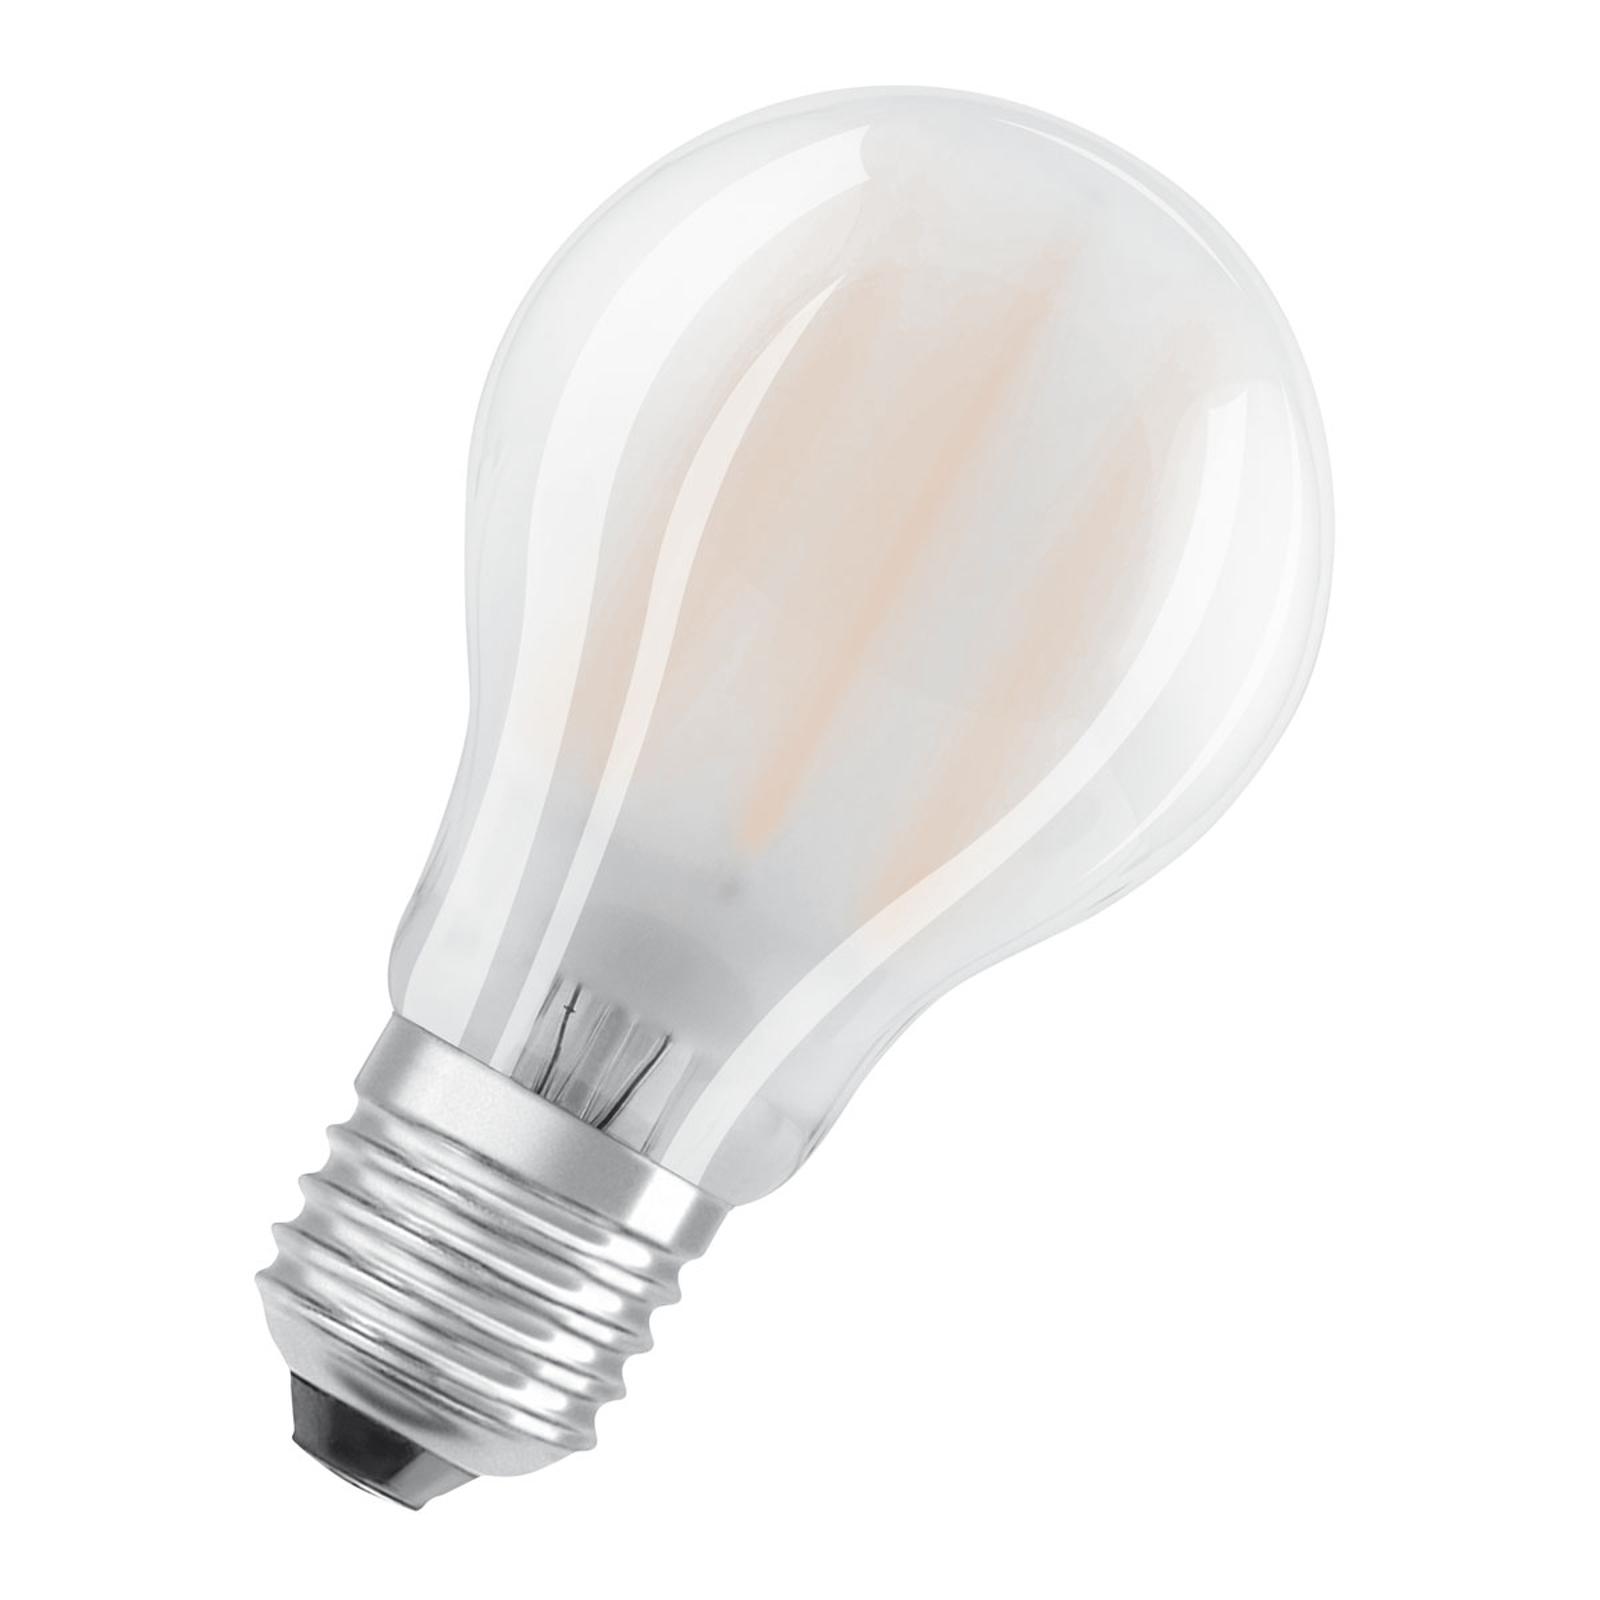 OSRAM LED-Lampe E27 Superstar 9W matt 4.000K dimmb